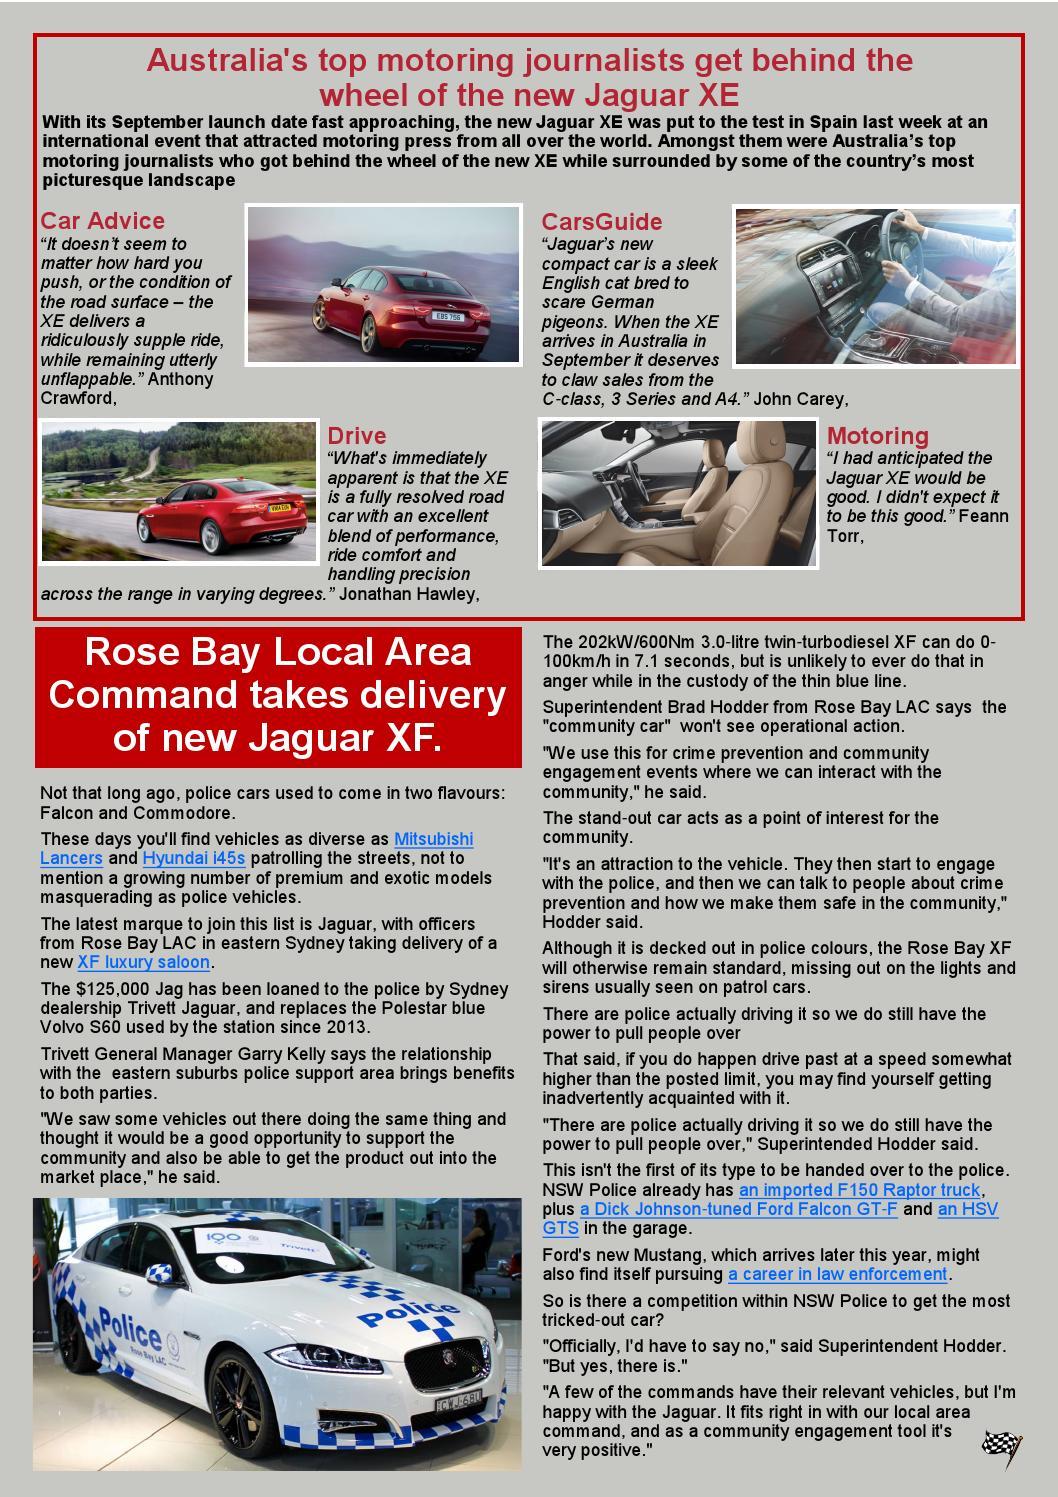 Classic marque june 2015 web by Jaguar Drivers Club of SA